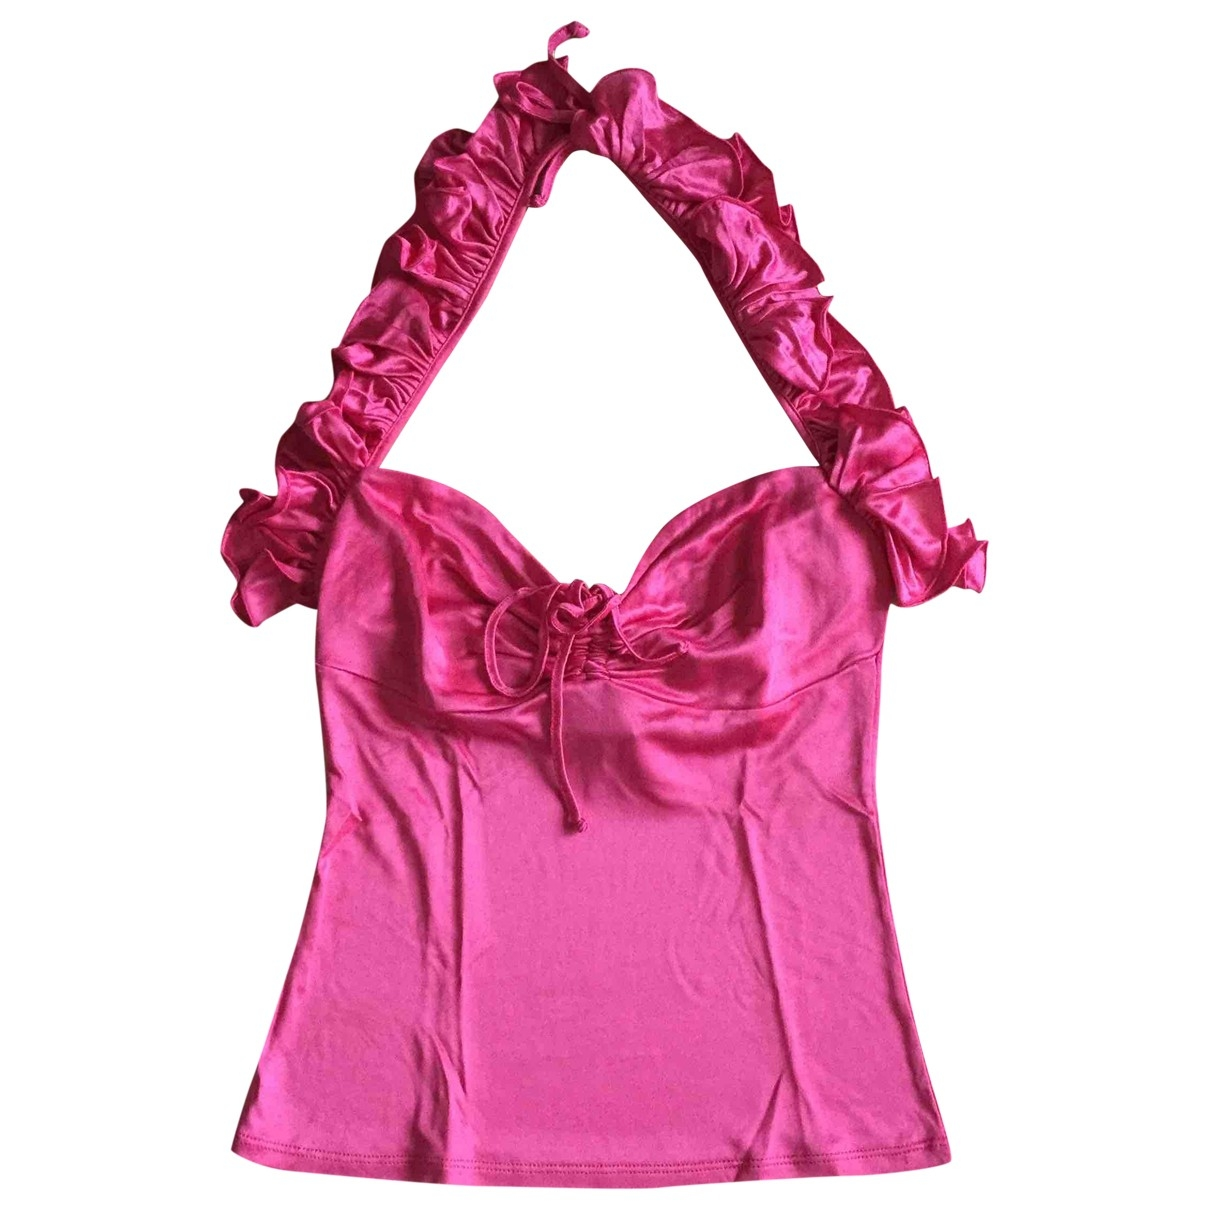 Versus - Top   pour femme - rose